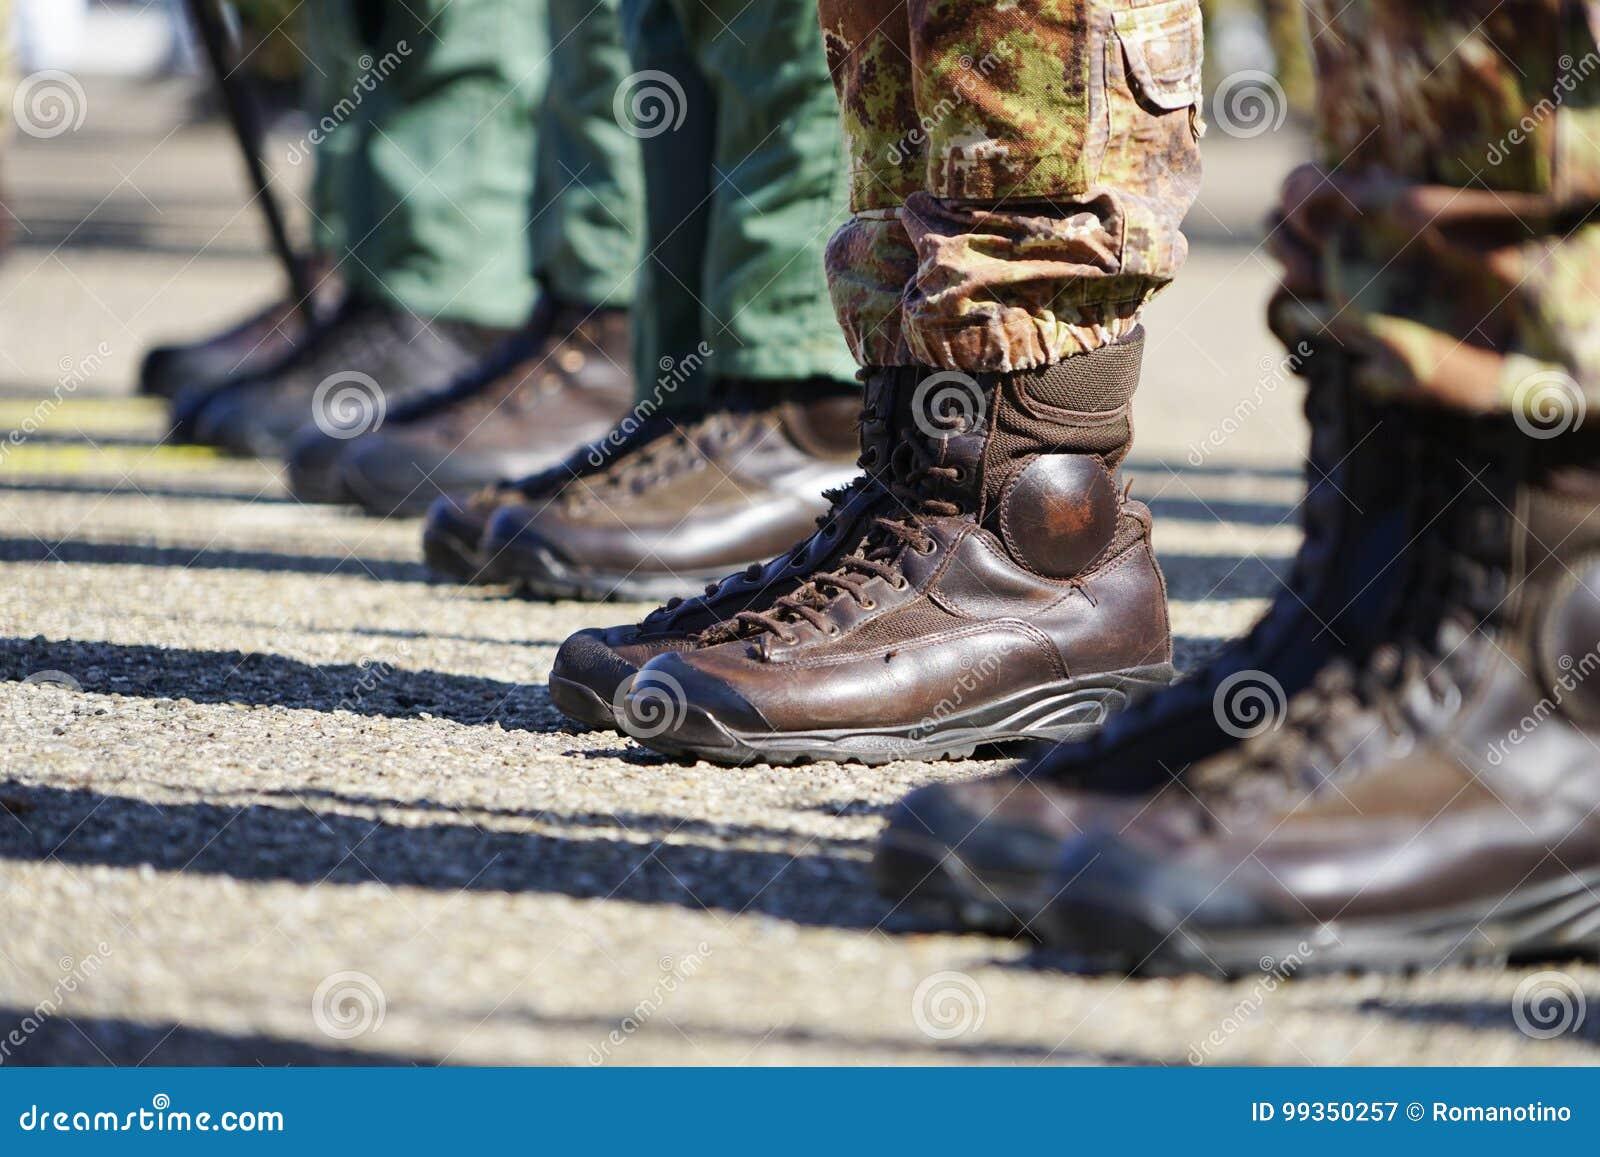 online store db8aa c83b3 Scarpe Che Anfibie Indossano Nei Militari Italiani Immagine ...